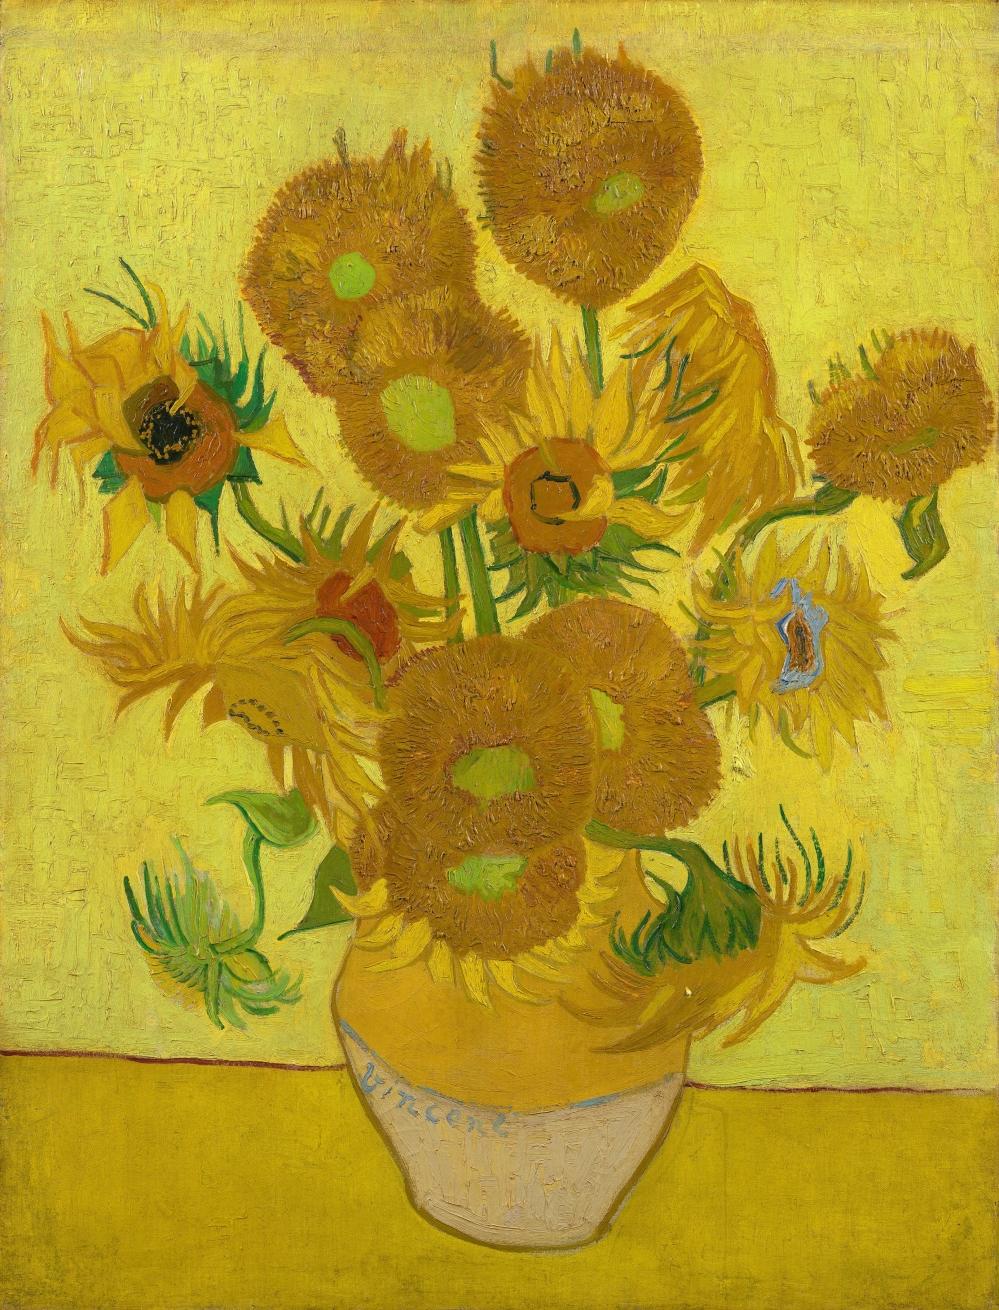 Vincent_van_Gogh_-_Sunflowers_-_VGM_F458.jpg